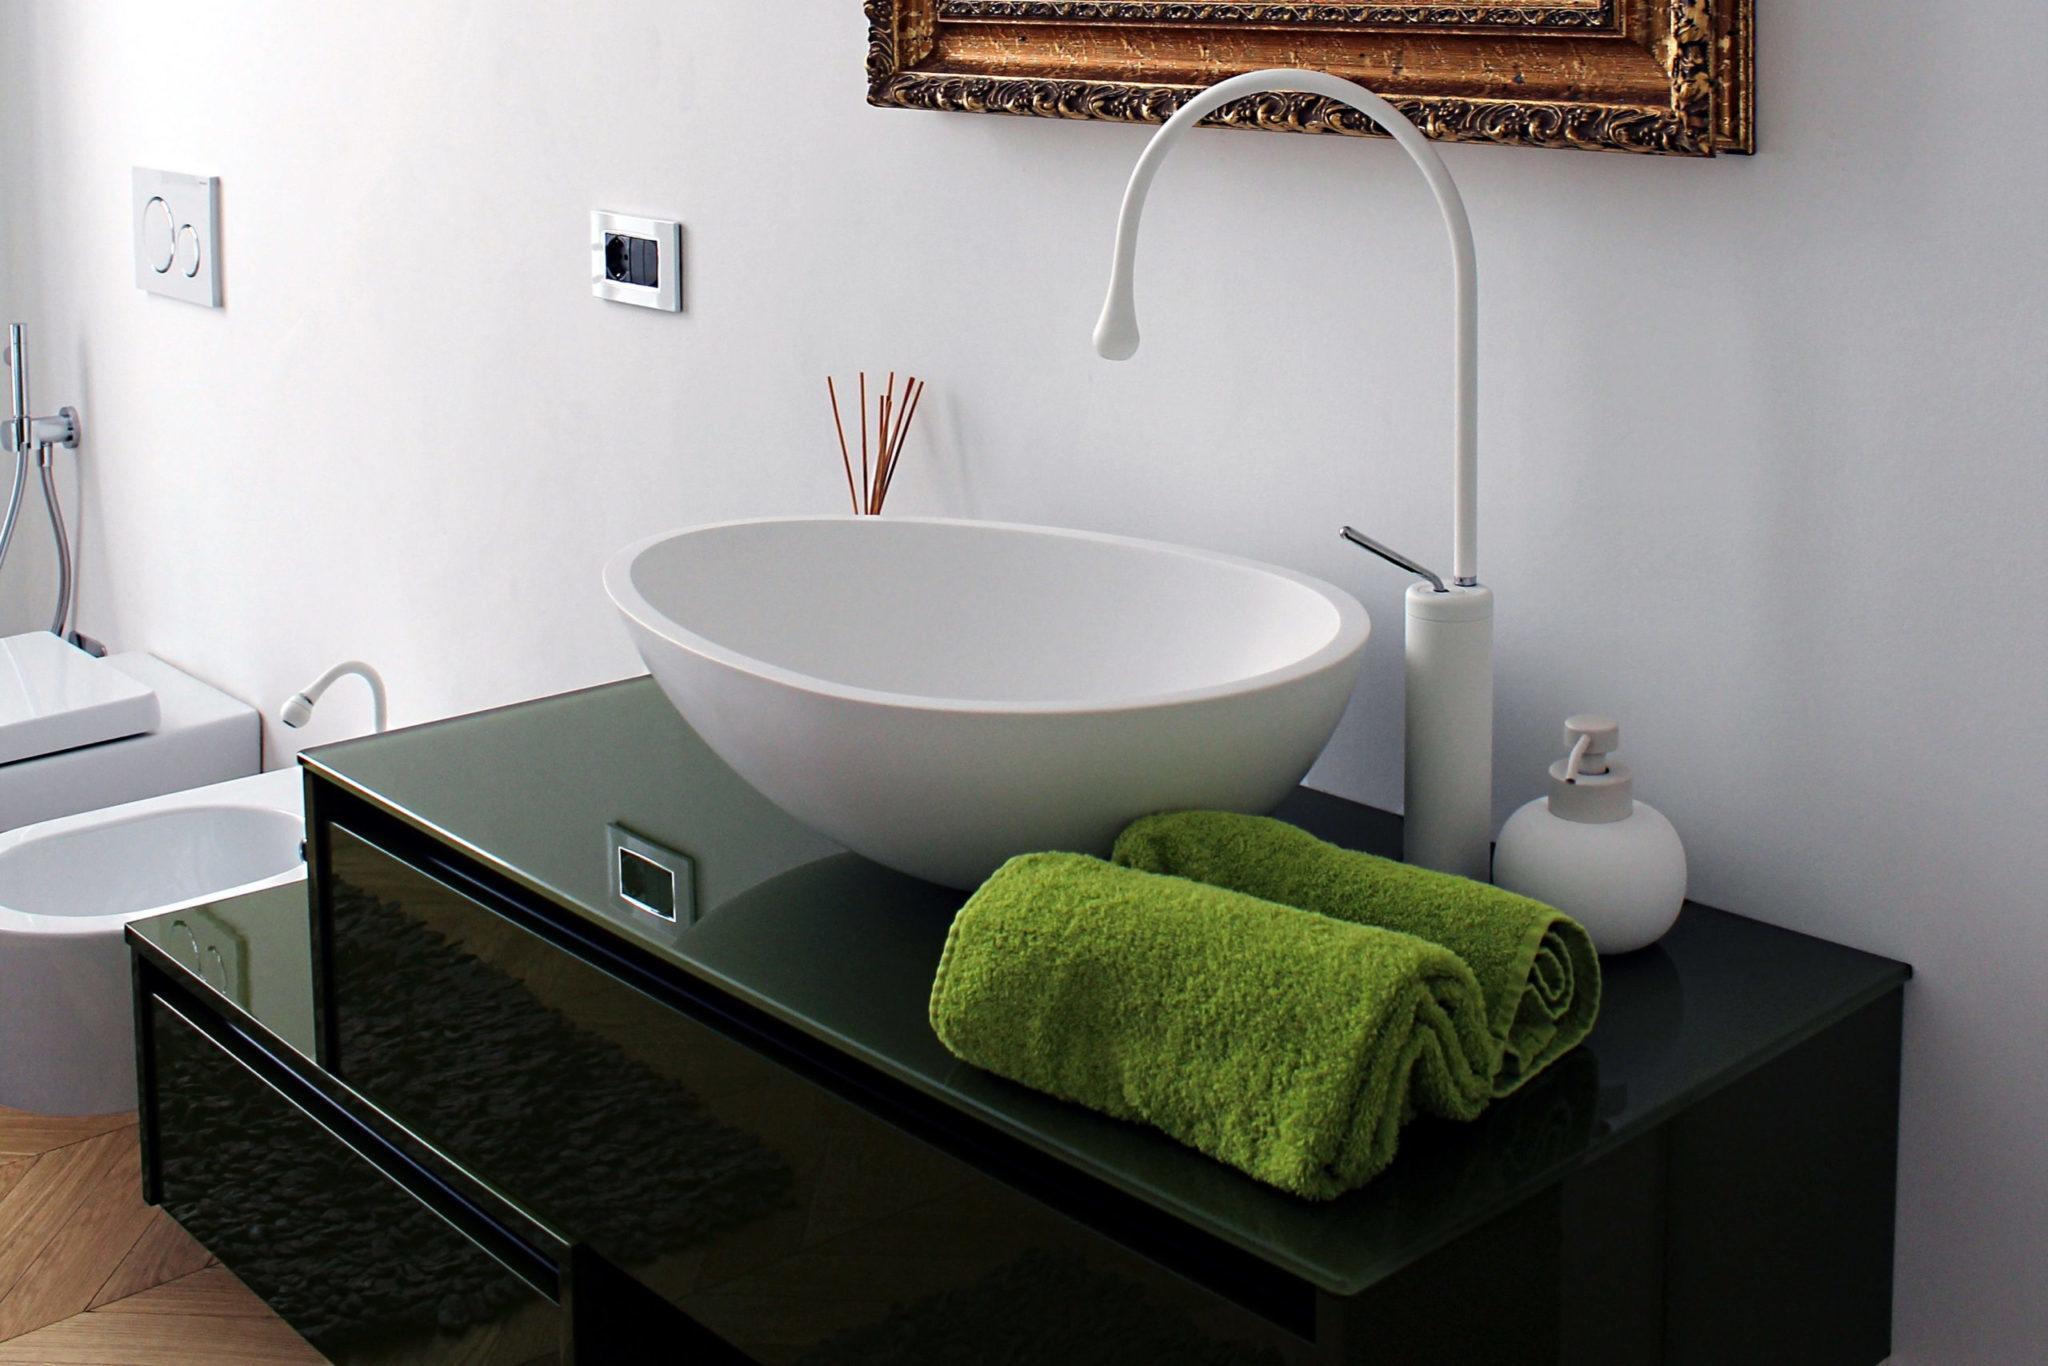 Arredo bagno,mobili bagno,mobiletti bagno,bagni moderni - IMG 0347 1 scaled